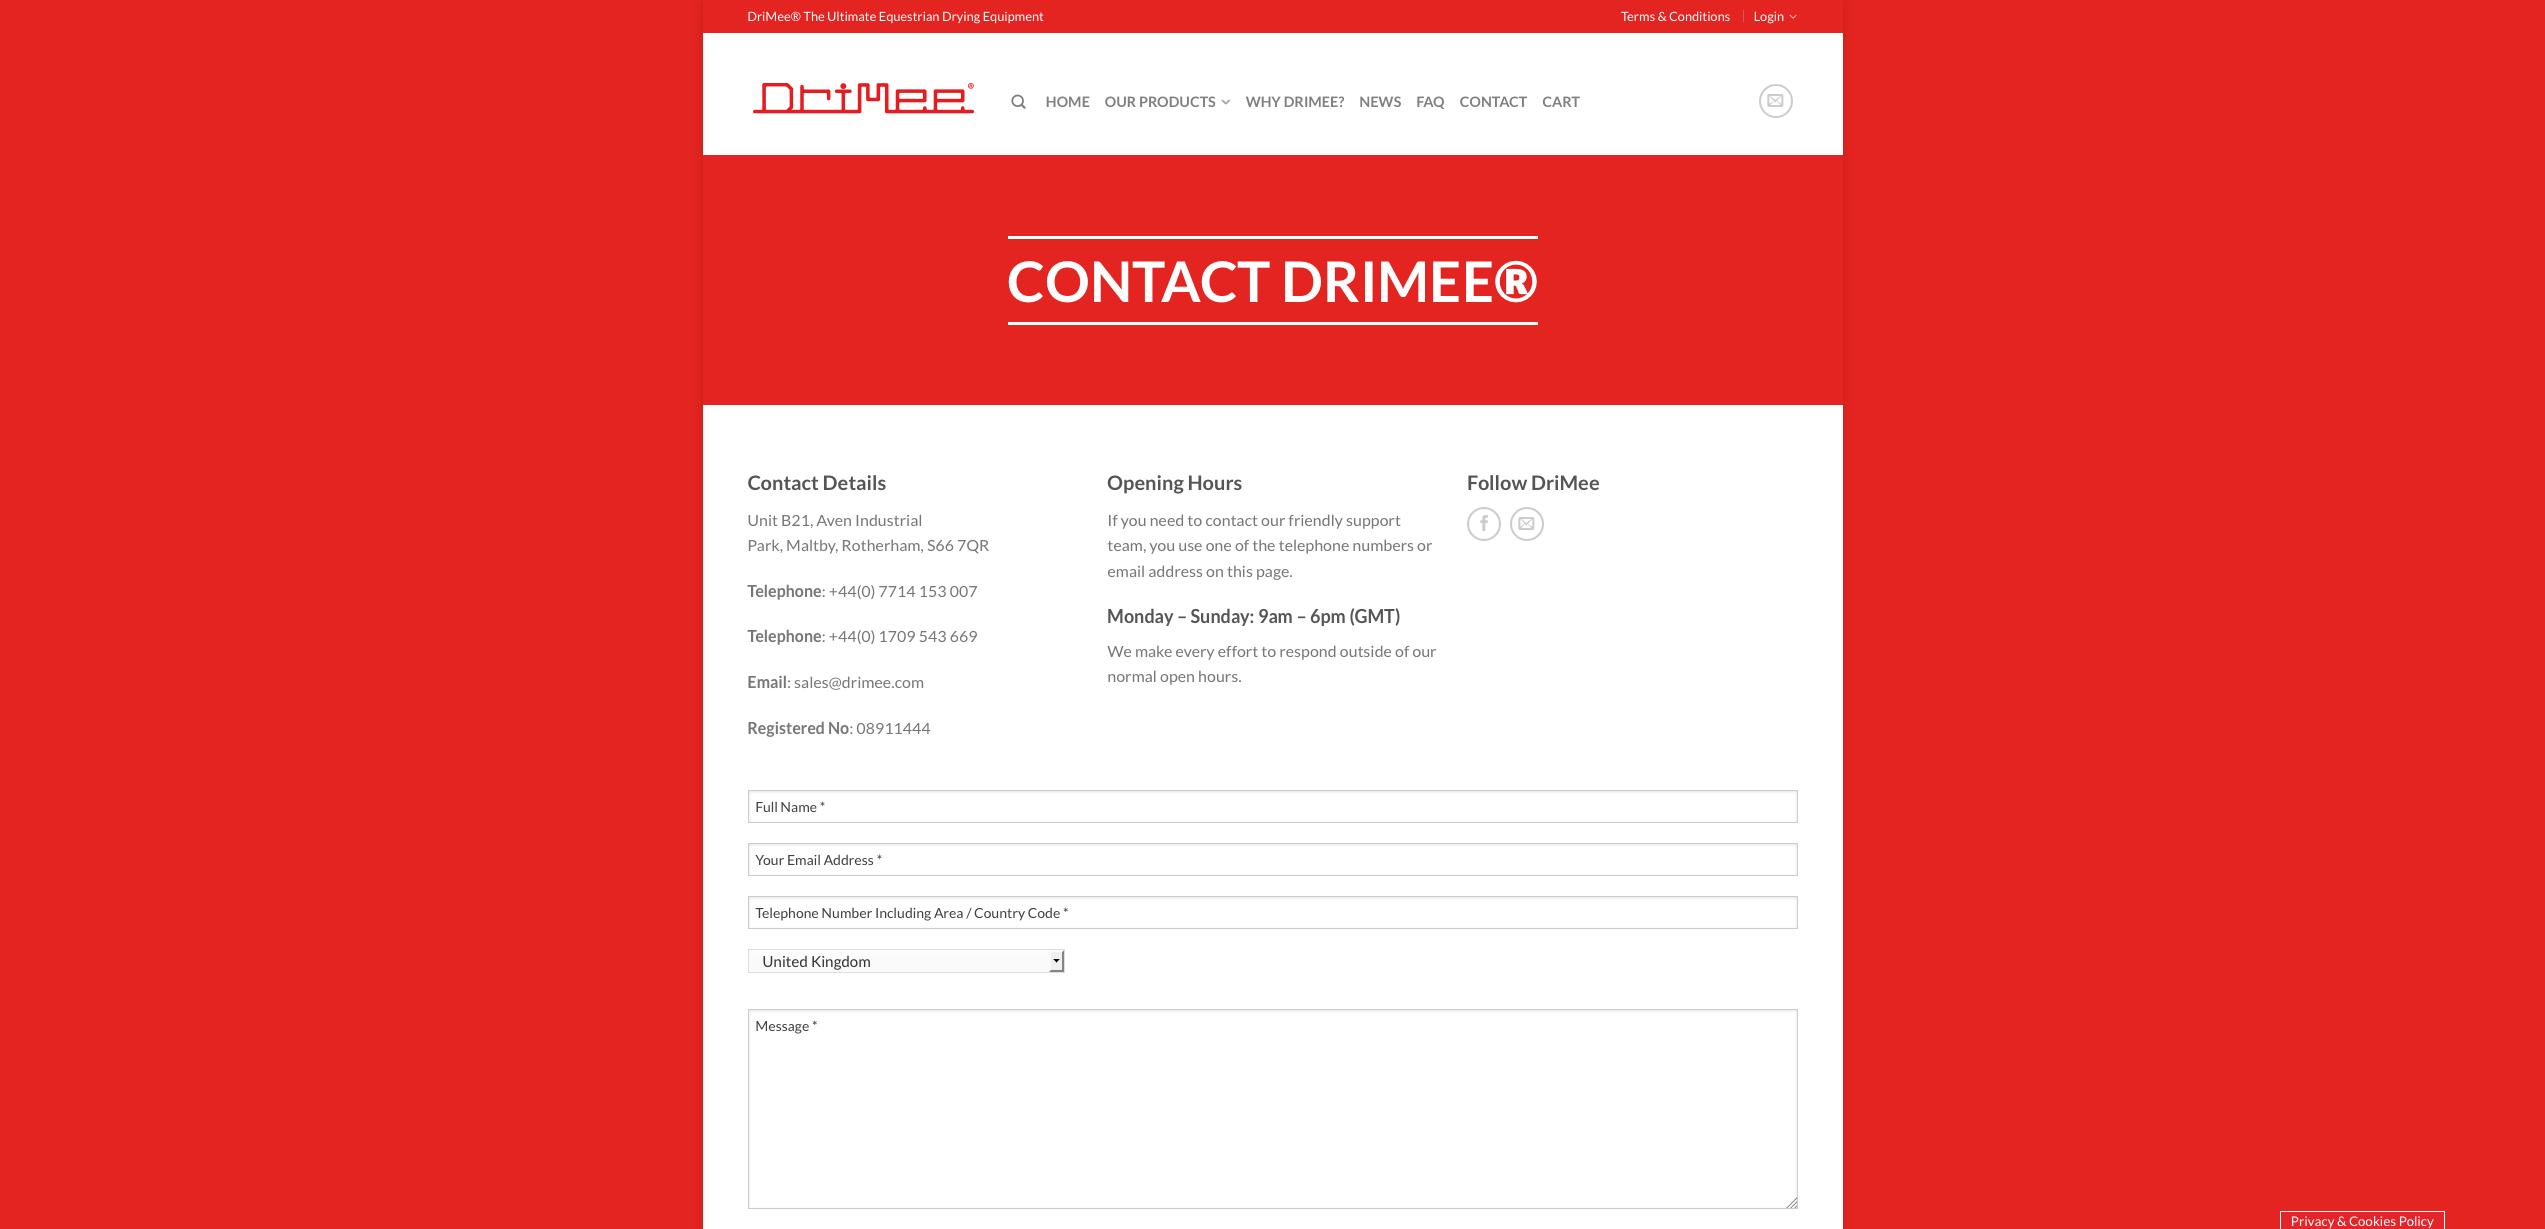 IDEA UK Design and Marketing Drimee Equestrian Horse Equipment Website Design 19